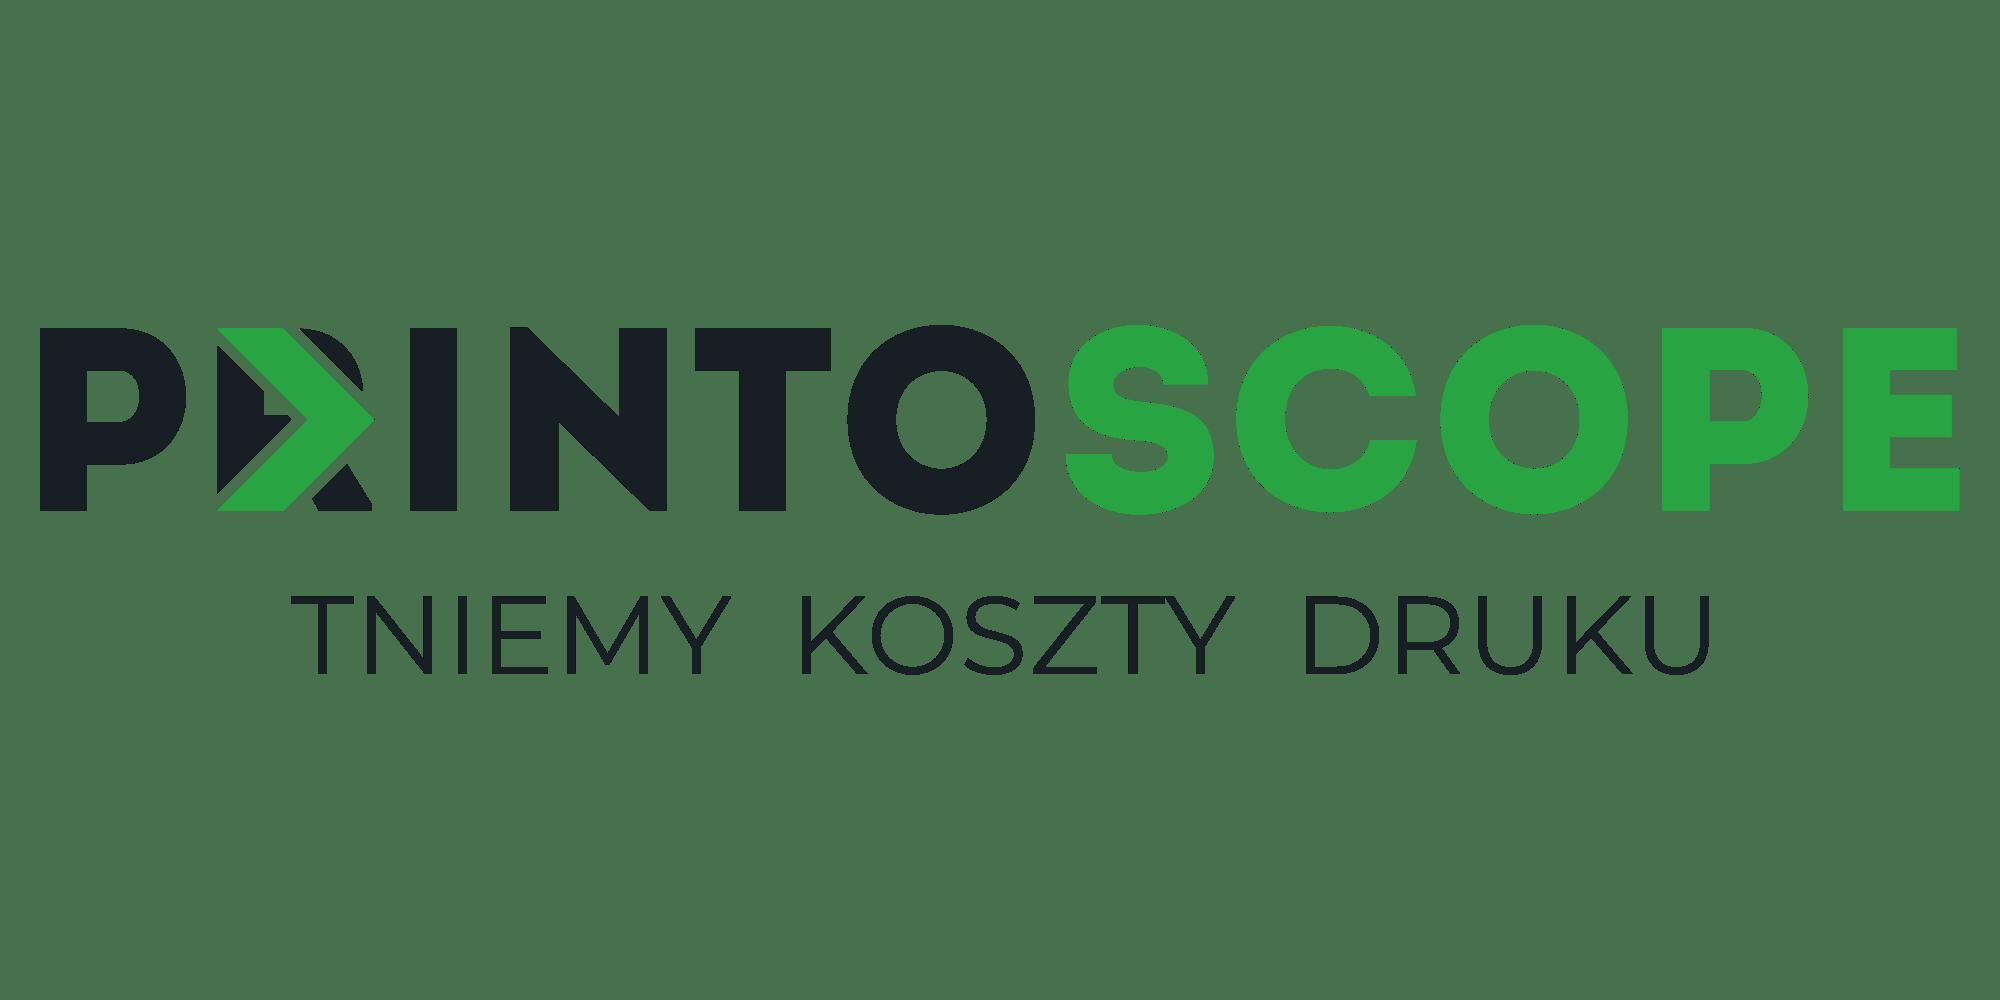 PrintoscopeLOGO